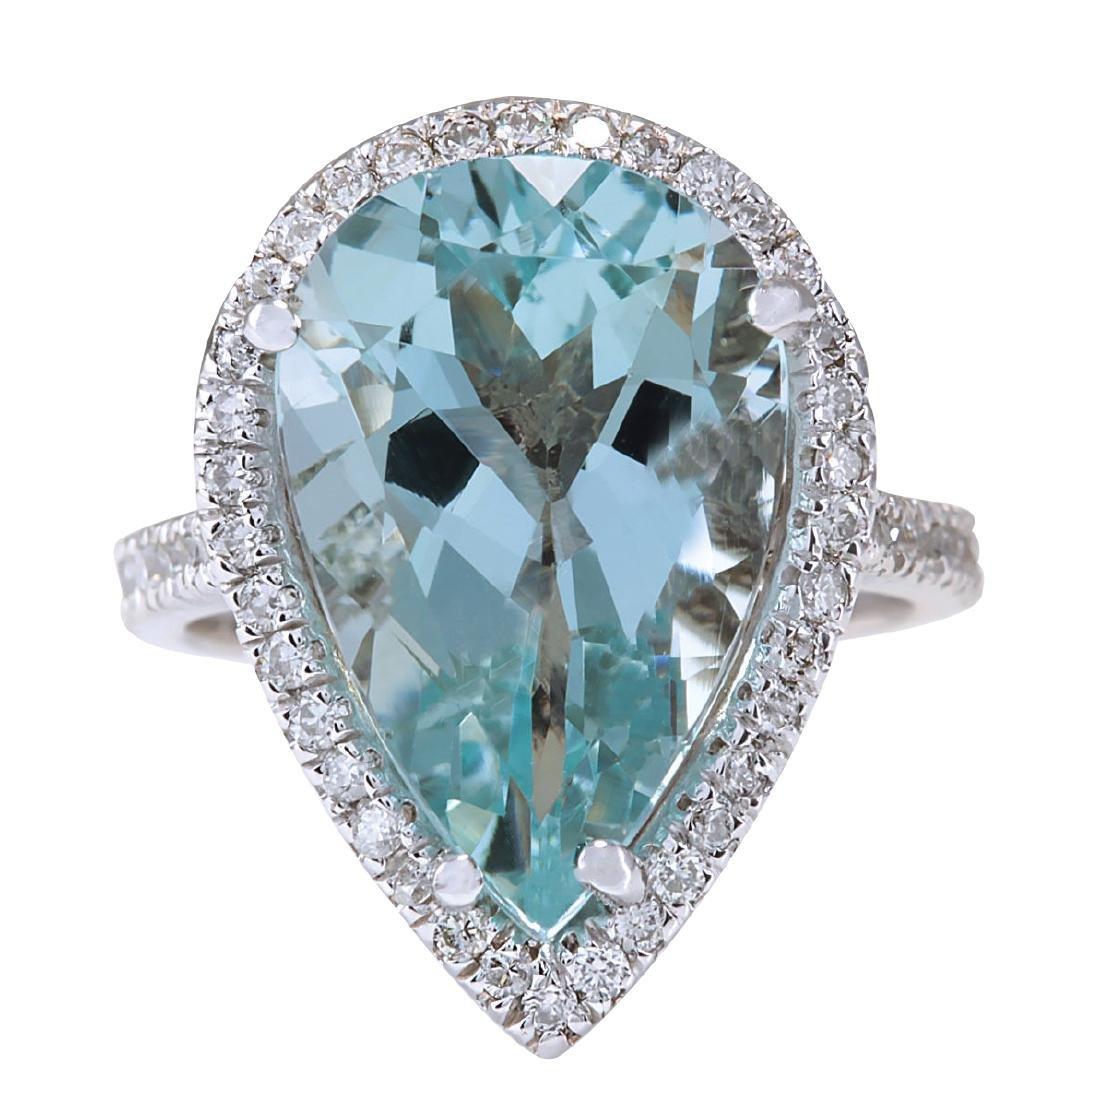 8.35CTW Natural Aquamarine And Diamond Ring In 18K